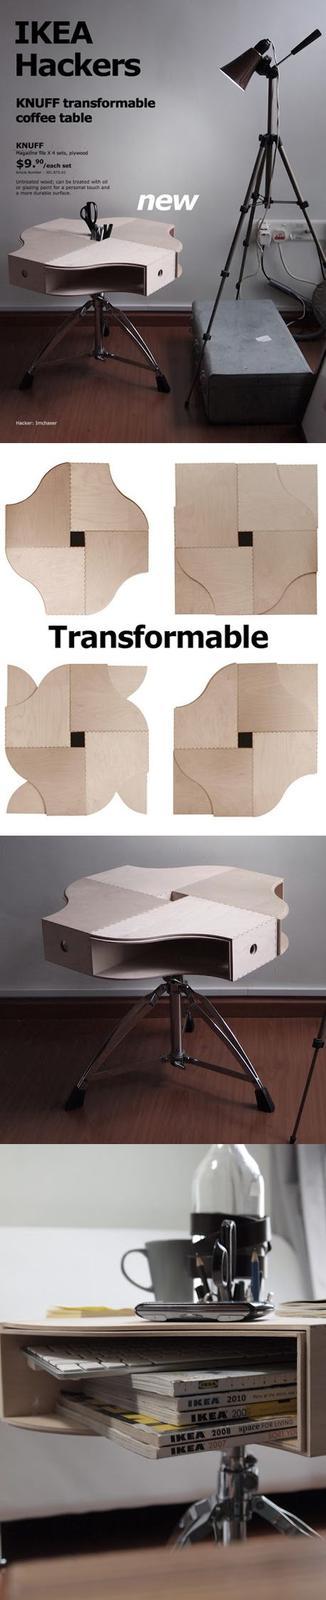 Trochu jiná Ikea....:-) - Obrázek č. 6